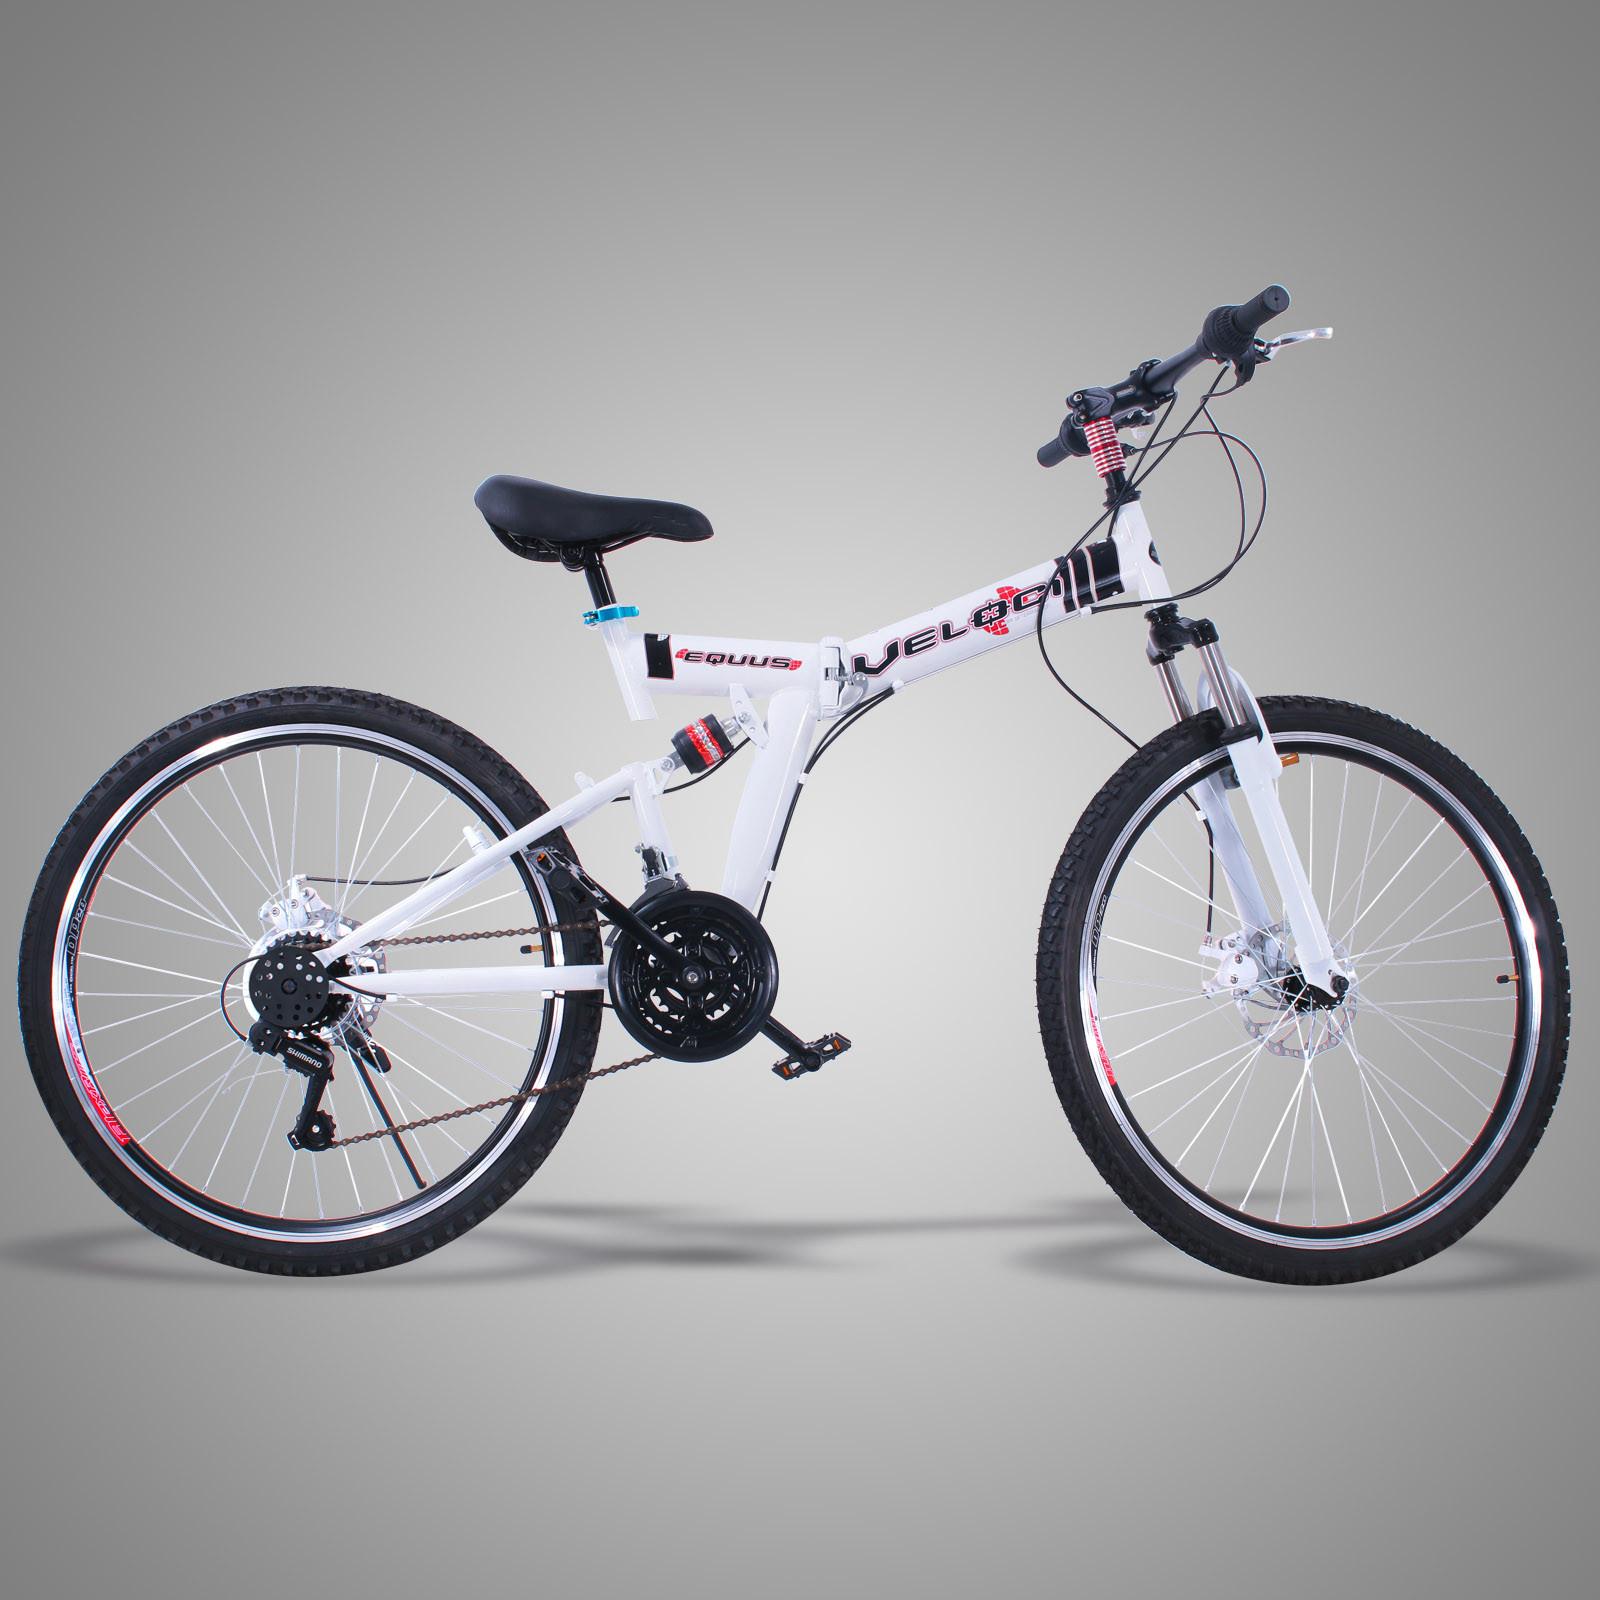 26 zoll mtb fahrrad 21 gang folding biycle school sport. Black Bedroom Furniture Sets. Home Design Ideas